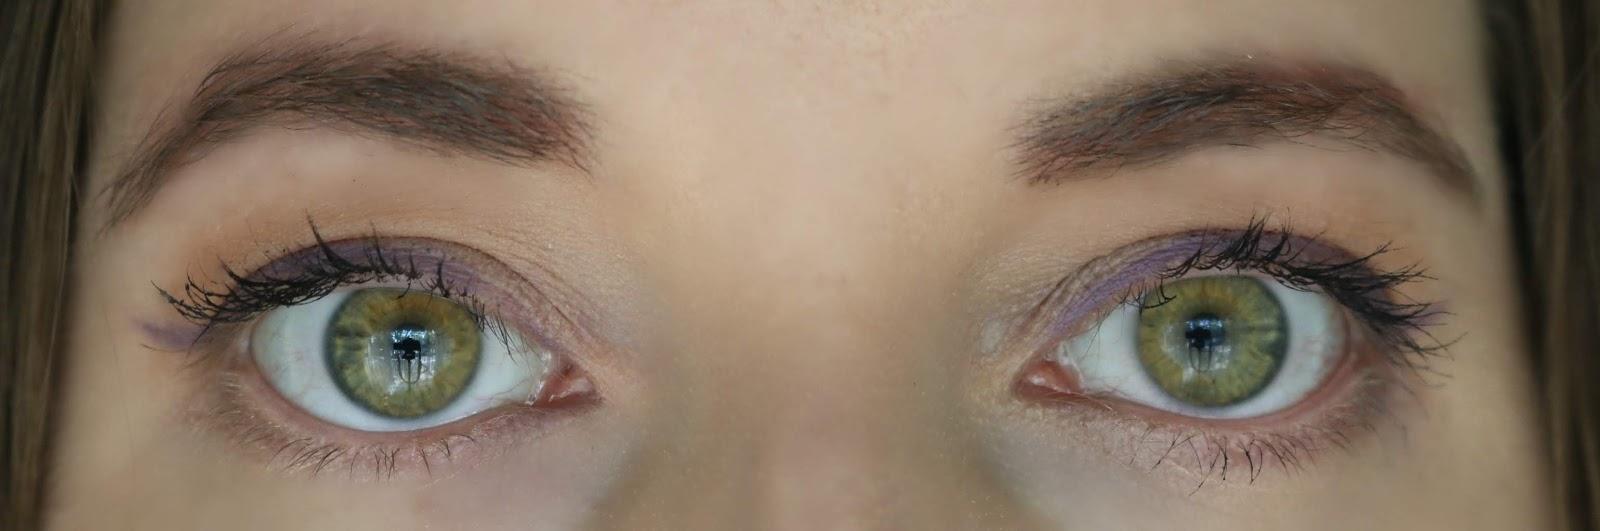 Make Up For Ever Artist Color Pencils 904 Worldly Mauve 502 Infinite Sand Eyes